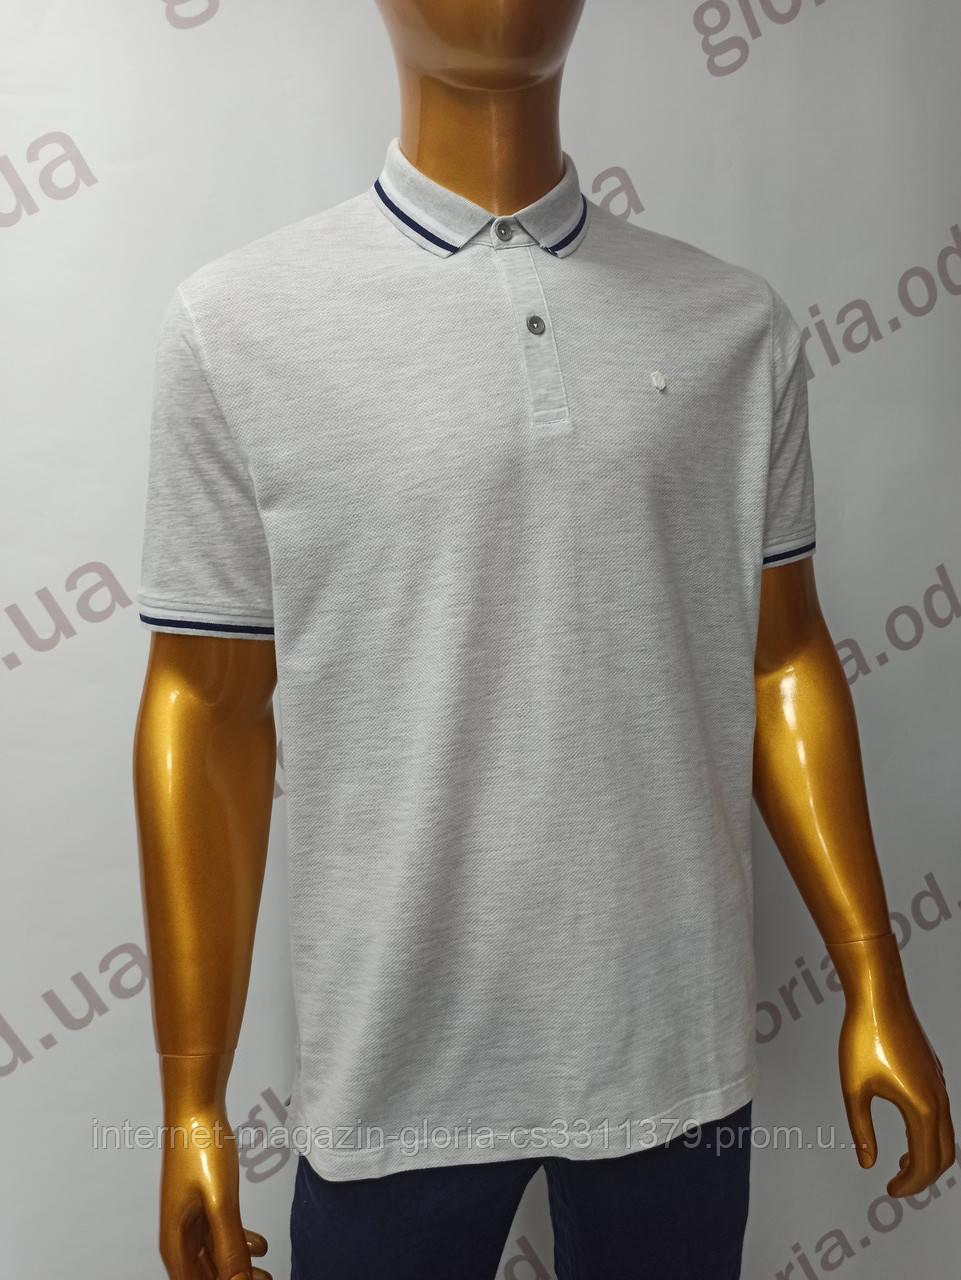 Мужская футболка Поло,Батал, MСL . PSL-26835(b). Размеры:  2XL(2),3XL,4XL.